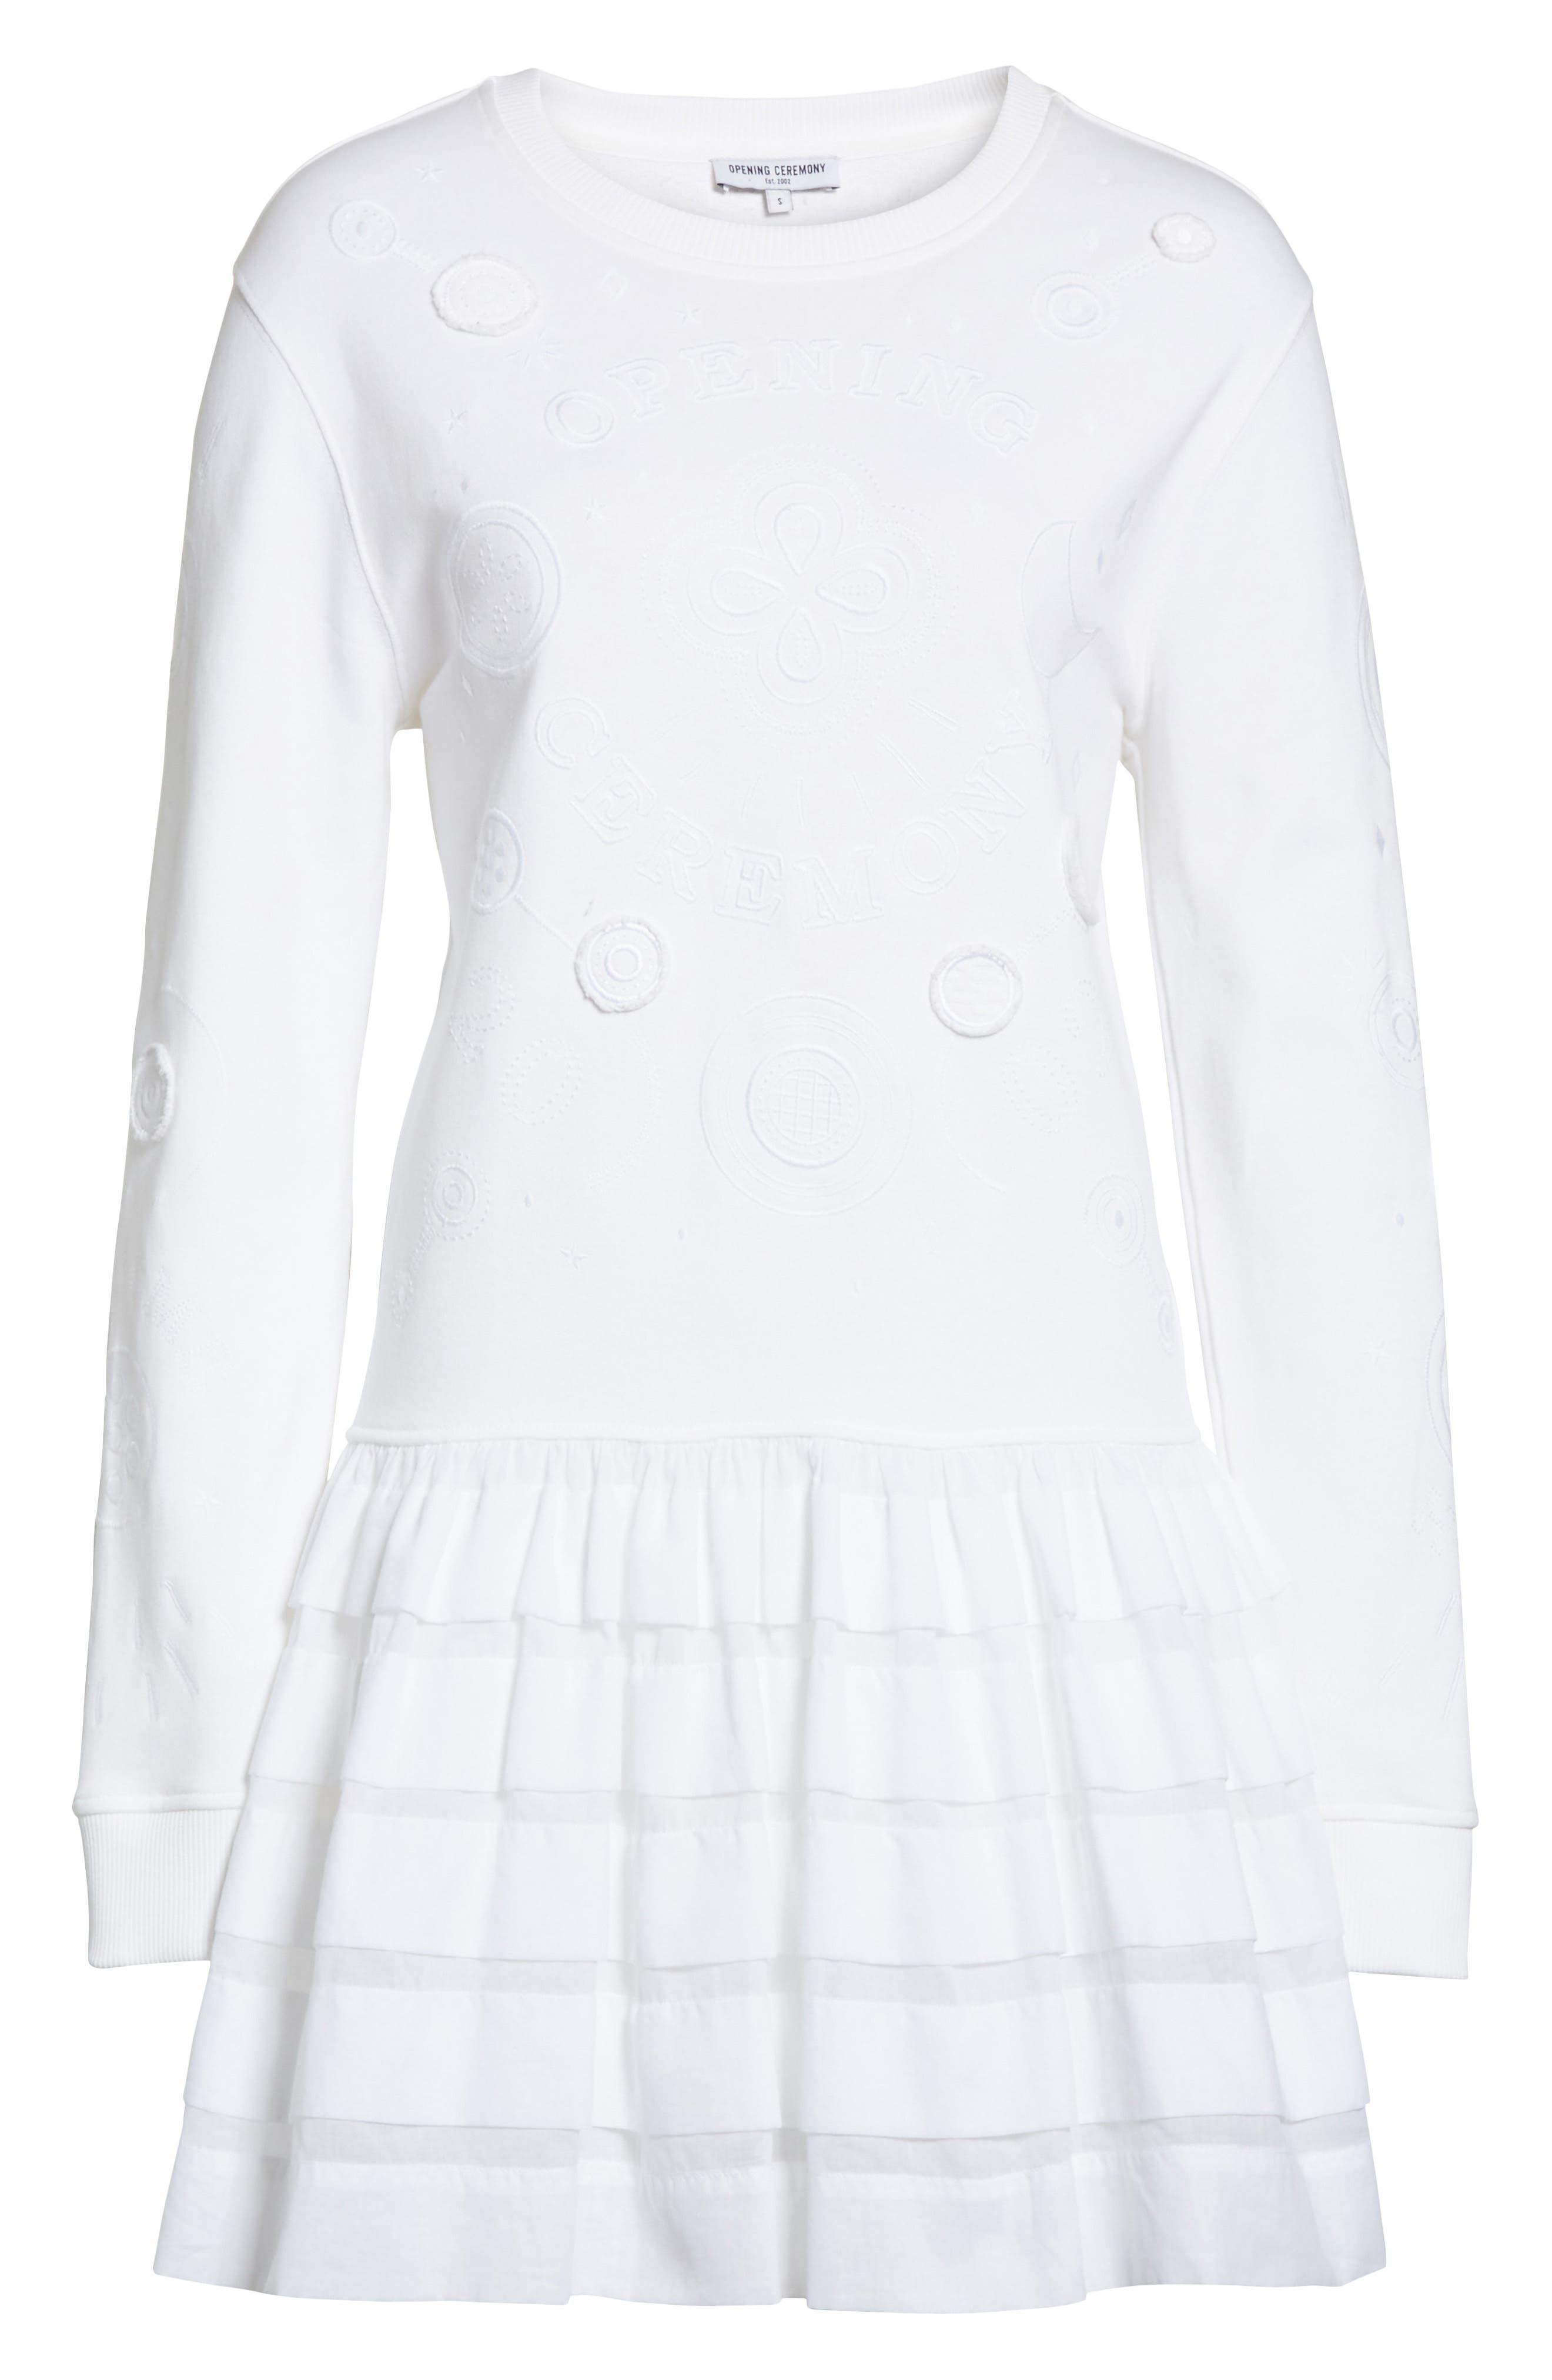 Embroidered Ruffle Hem Dress,                             Alternate thumbnail 6, color,                             White